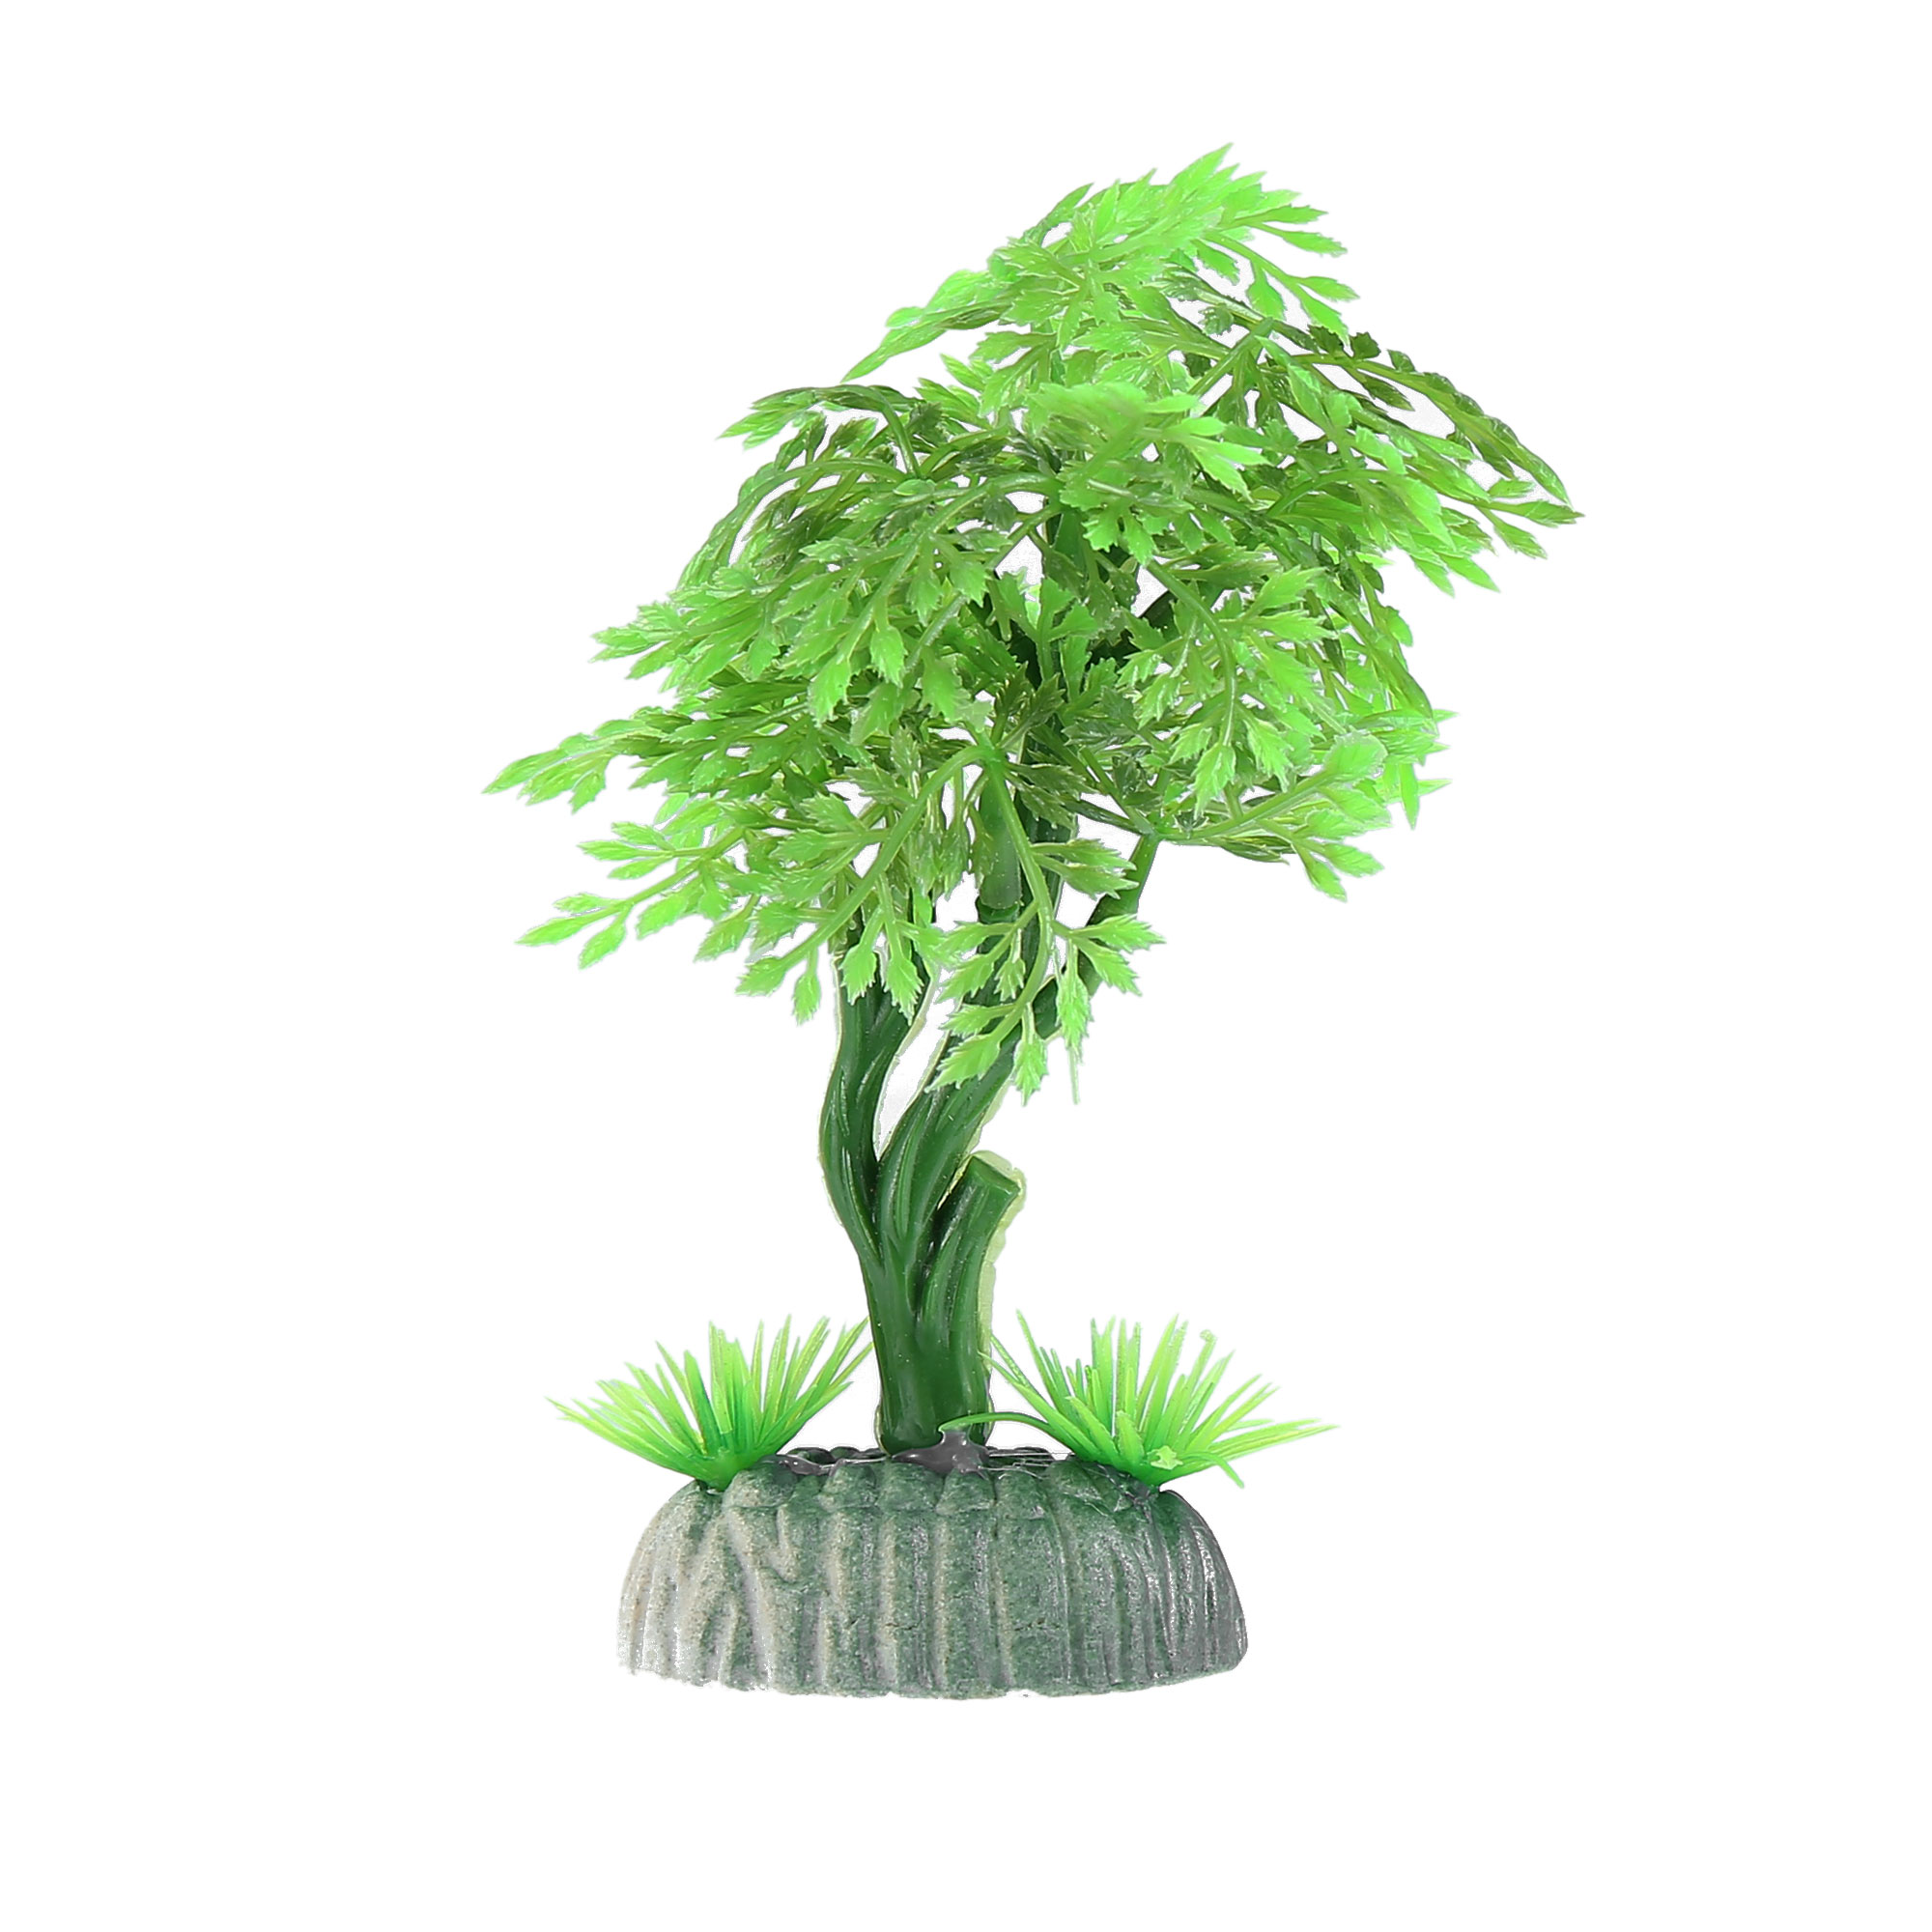 Green Plastic Plant Fishbowl Aquarium Ornament Home Decoration for Small Tanks